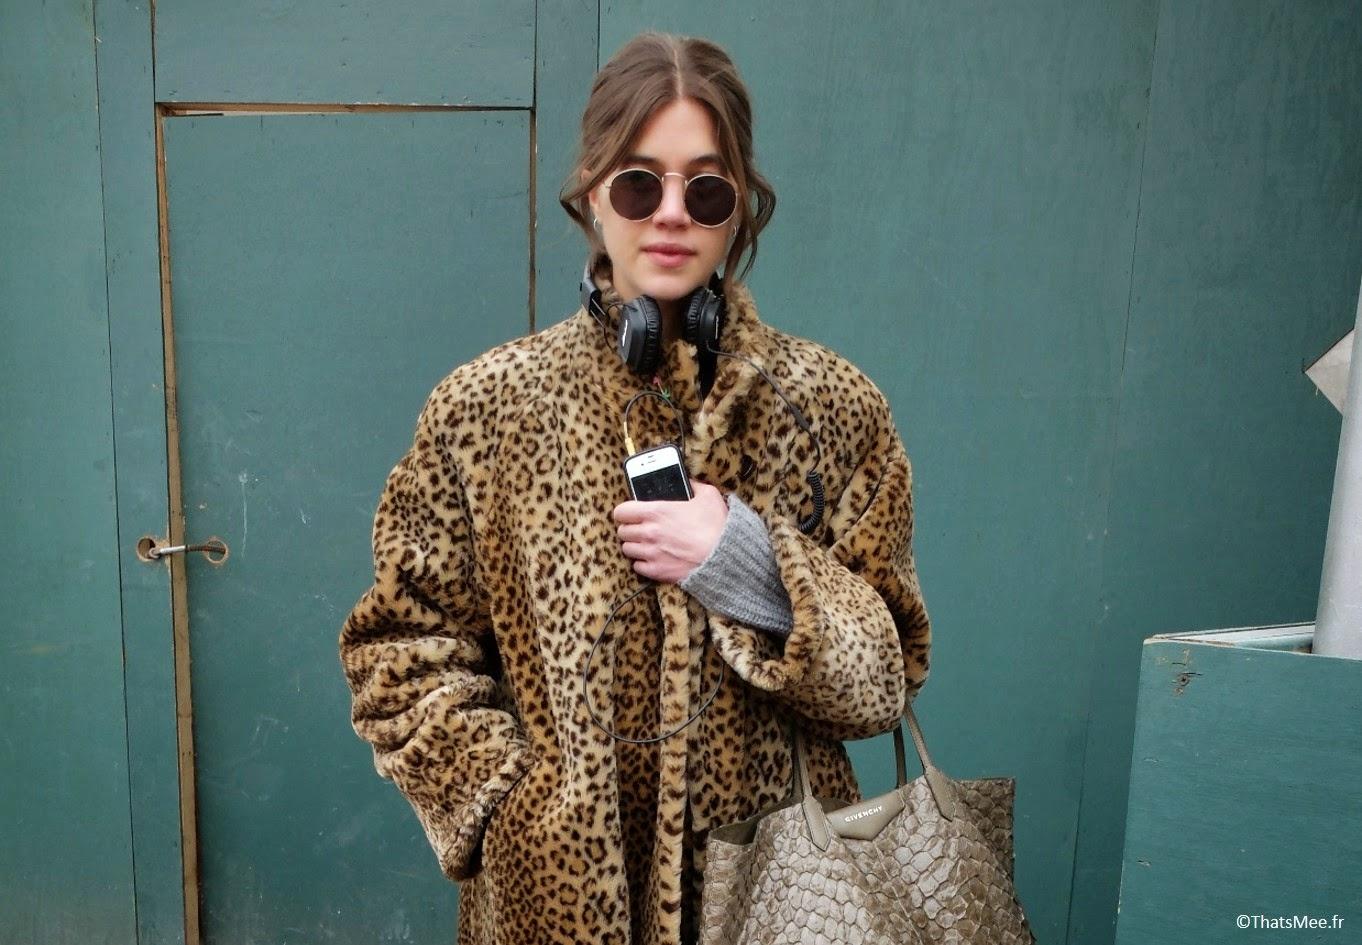 Look glamour rock fourrure, sac cabas Givenchy croco sable doré, manteau 3/4 fourrure leopard, derbies vernies boucles Topshop, jean brut cropped Marques Almeida x Topshop, lunettes rondes Ray-Ban